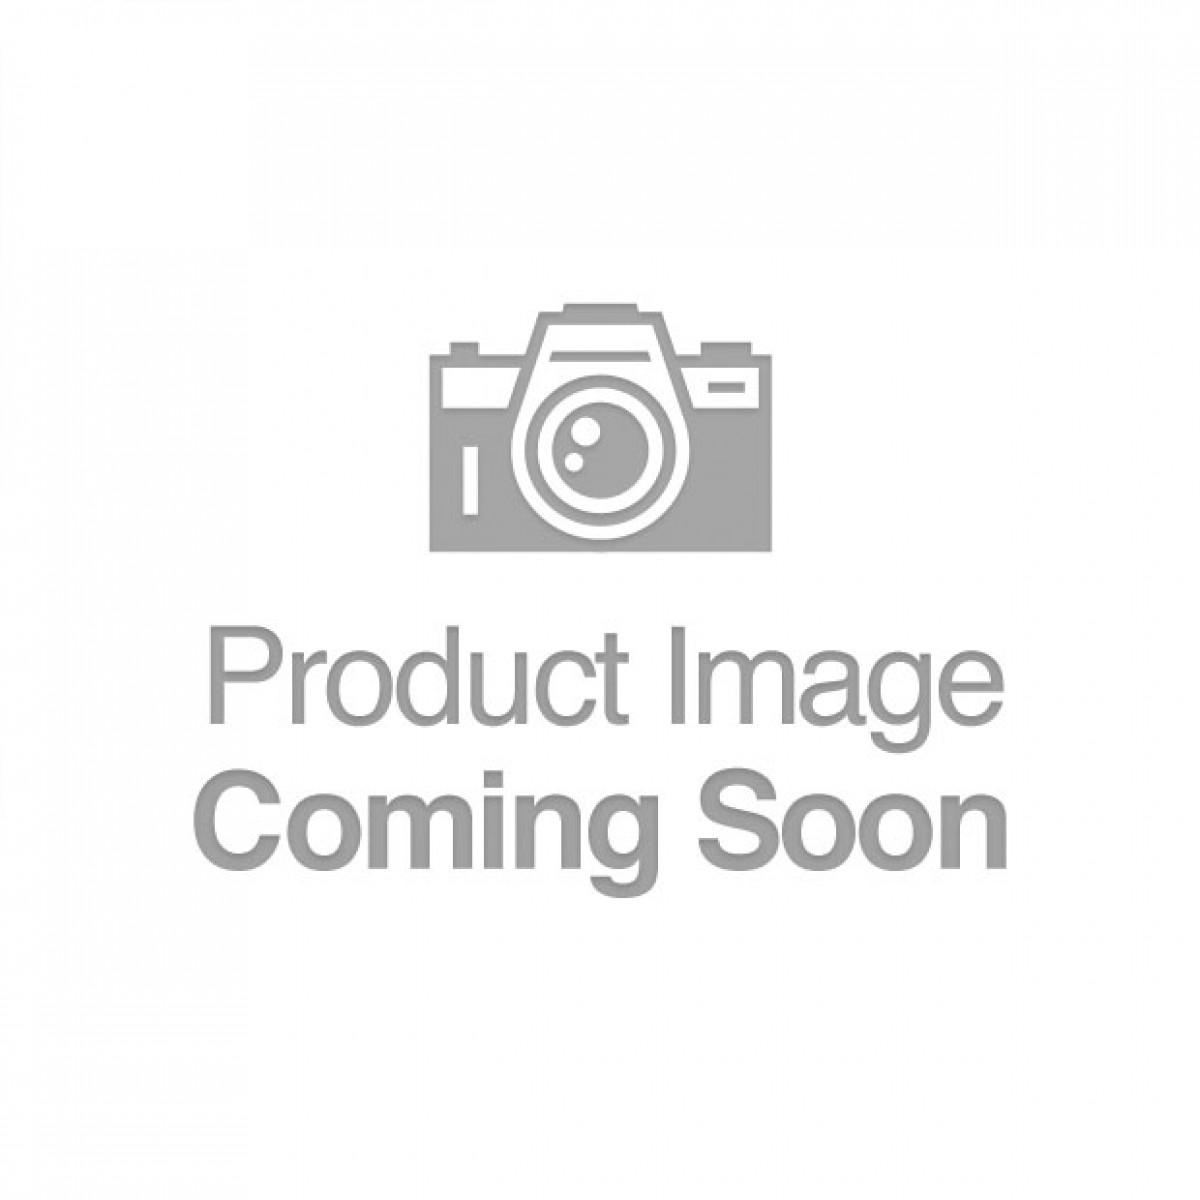 Zero Tolerance Riley Reid Body Stroker w/Movie Download